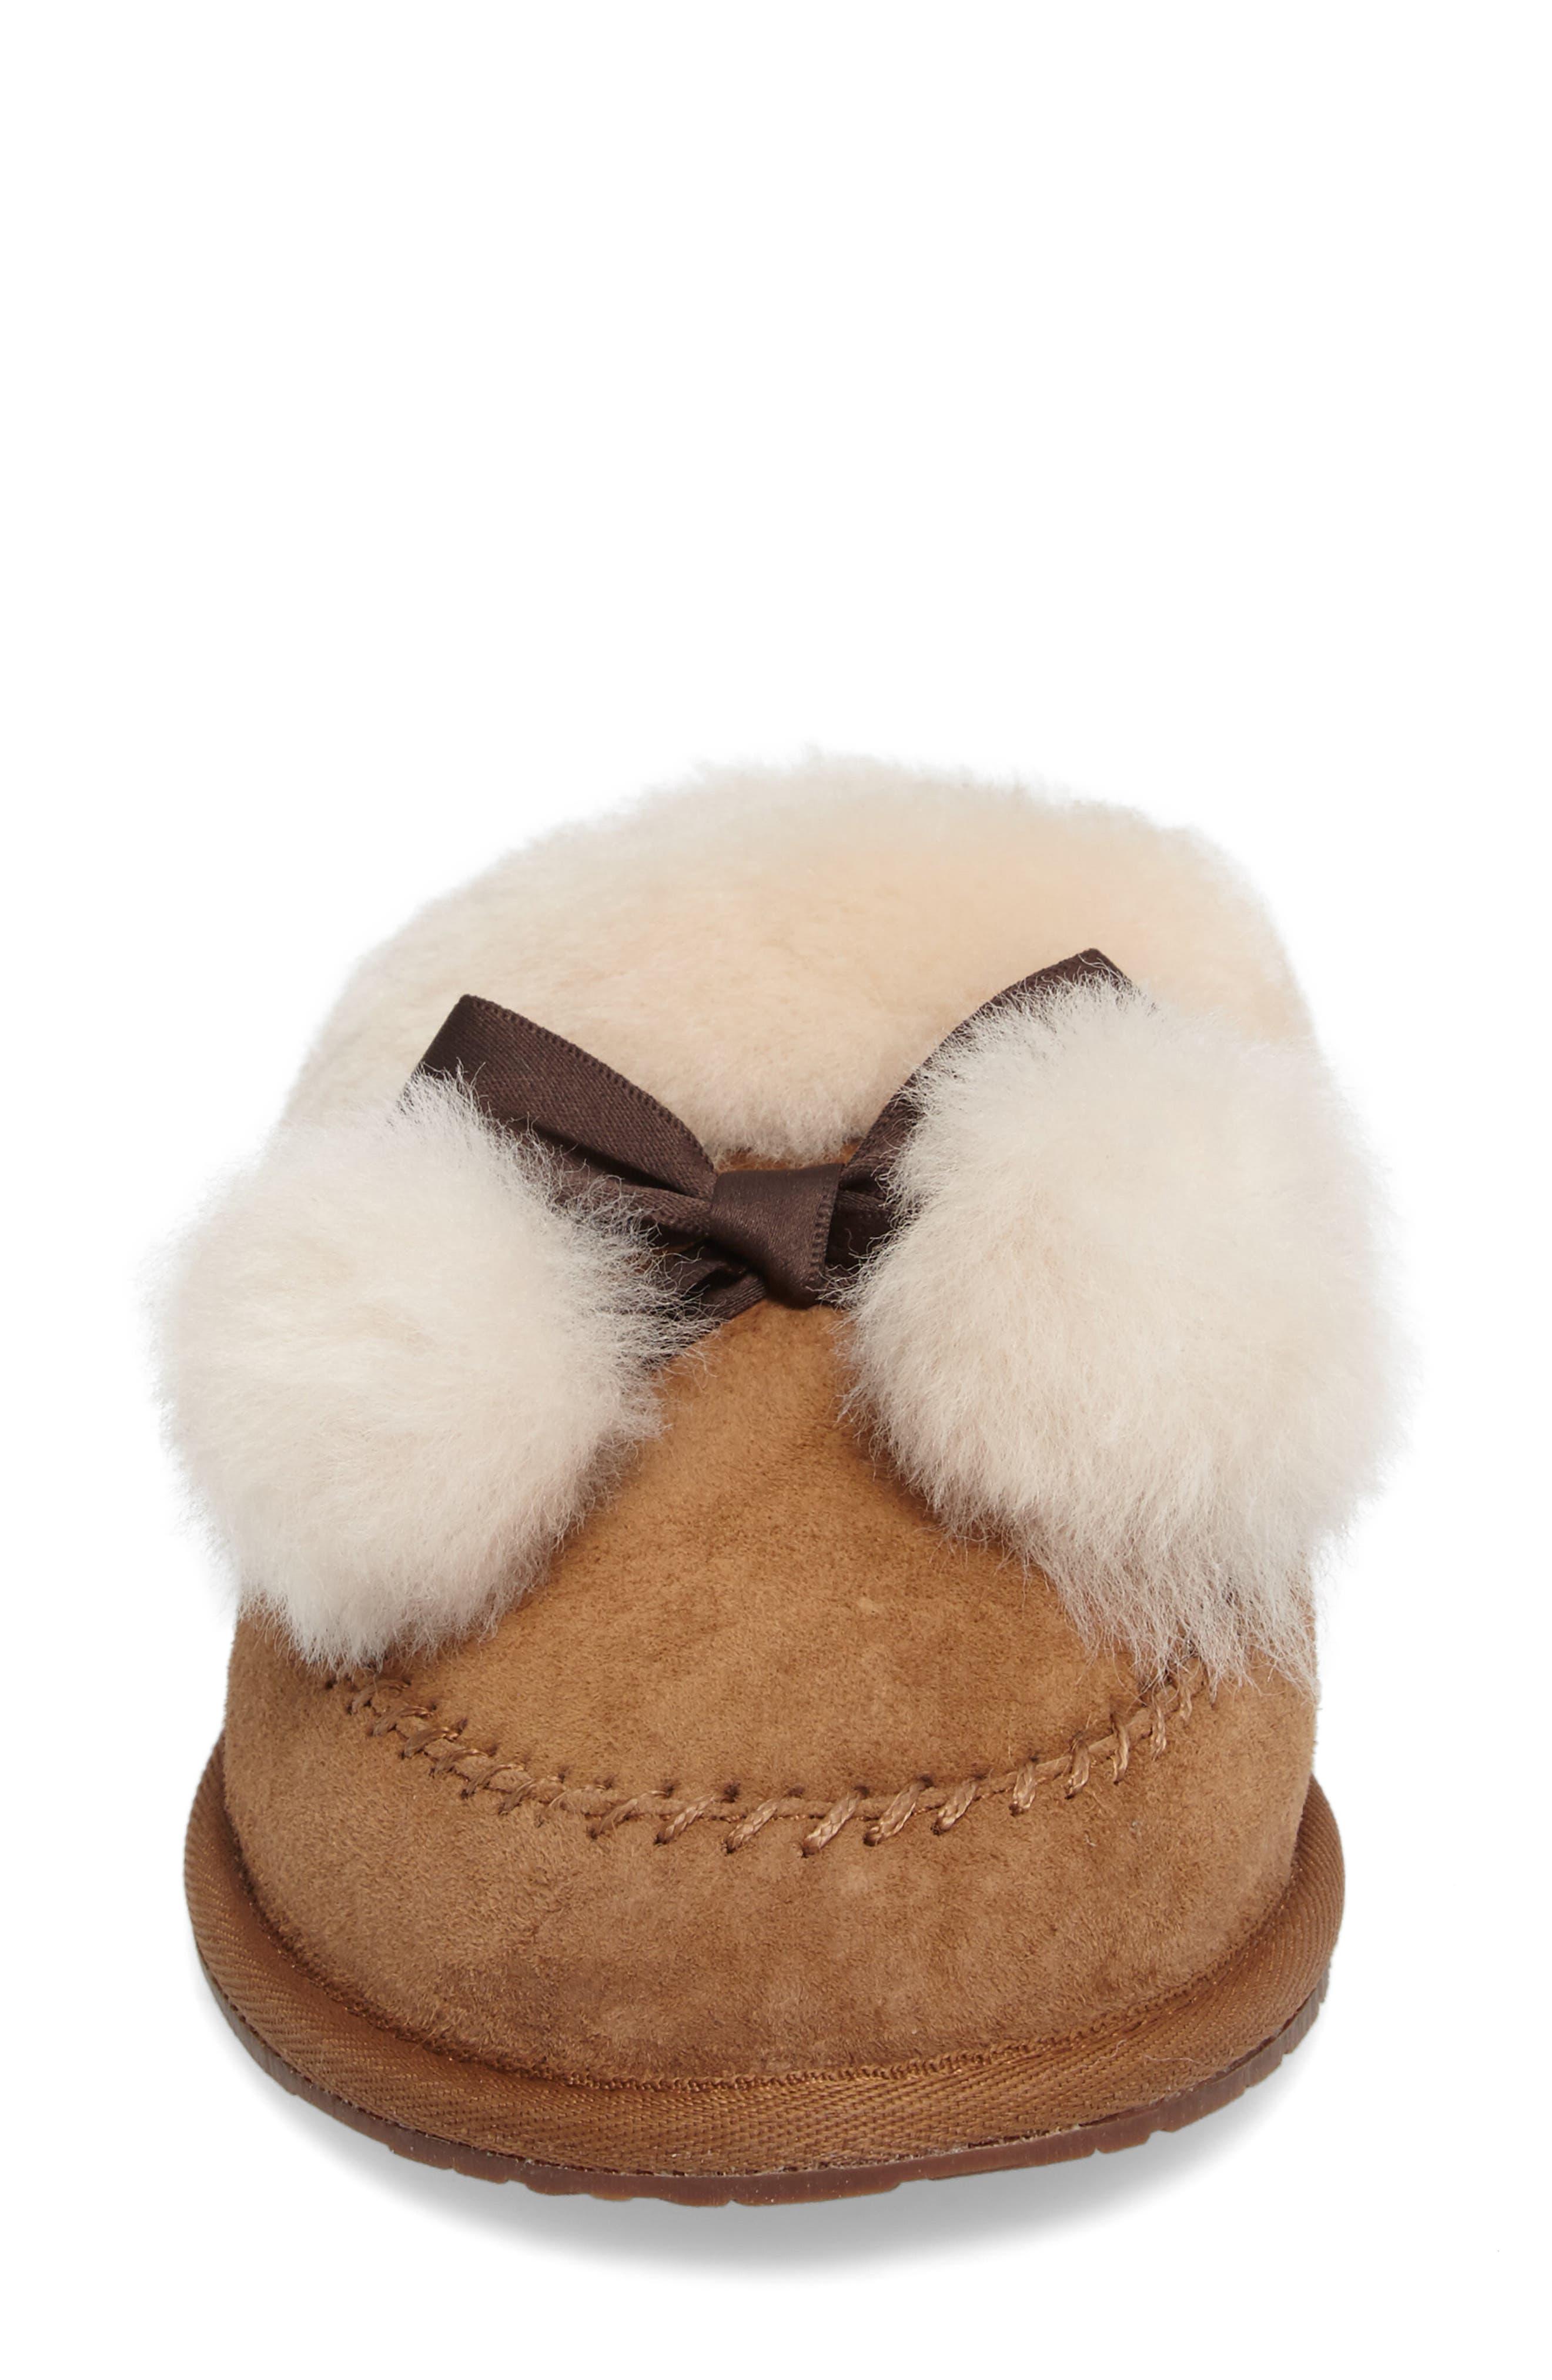 Hafnier Genuine Shearling Slipper,                             Alternate thumbnail 4, color,                             Chestnut Suede